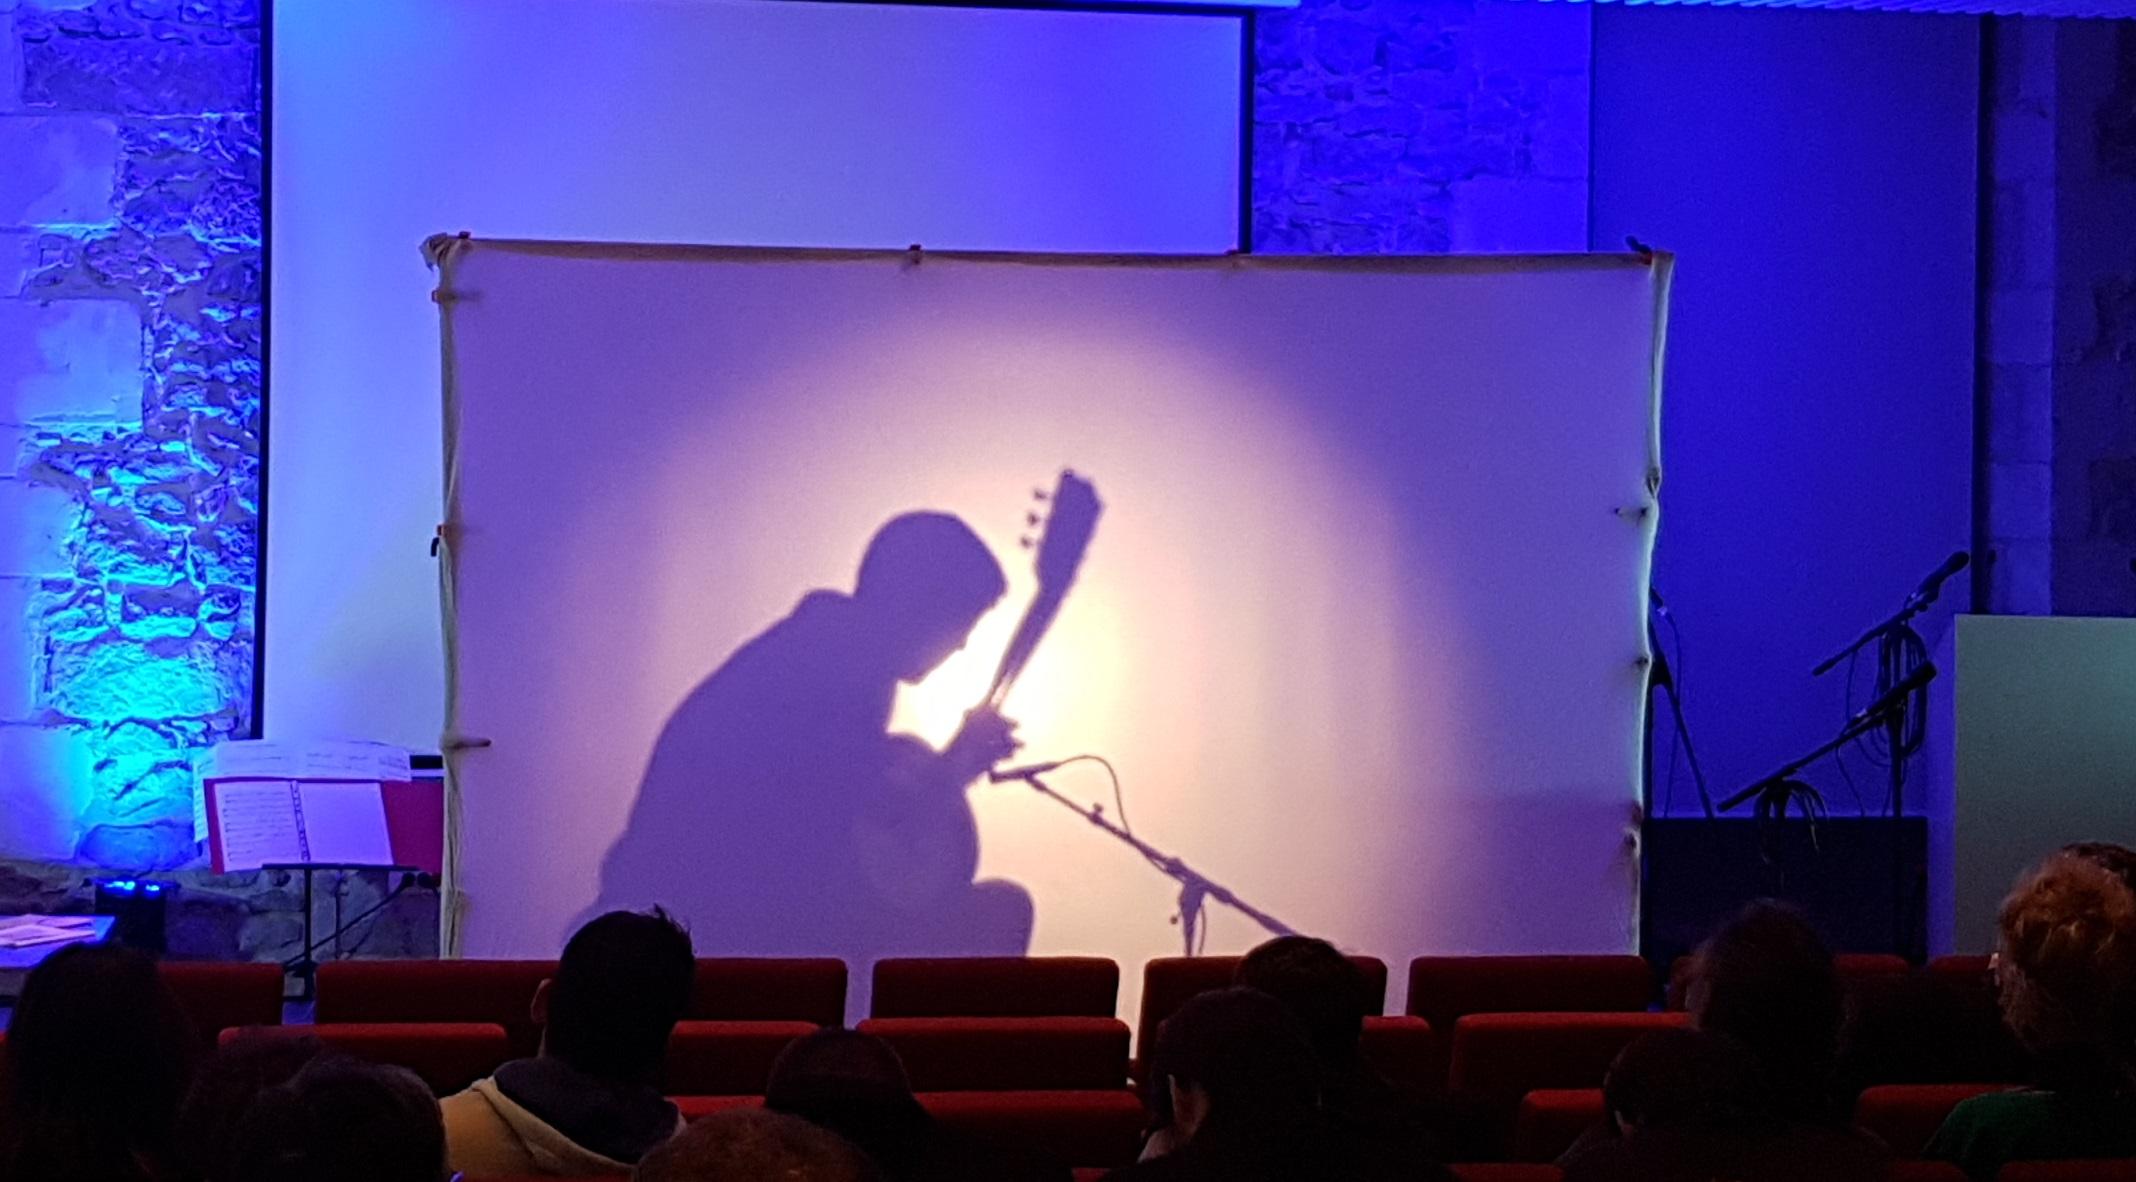 Bilan de la rencontre lutherie innovante du mardi 20 novembre 2018